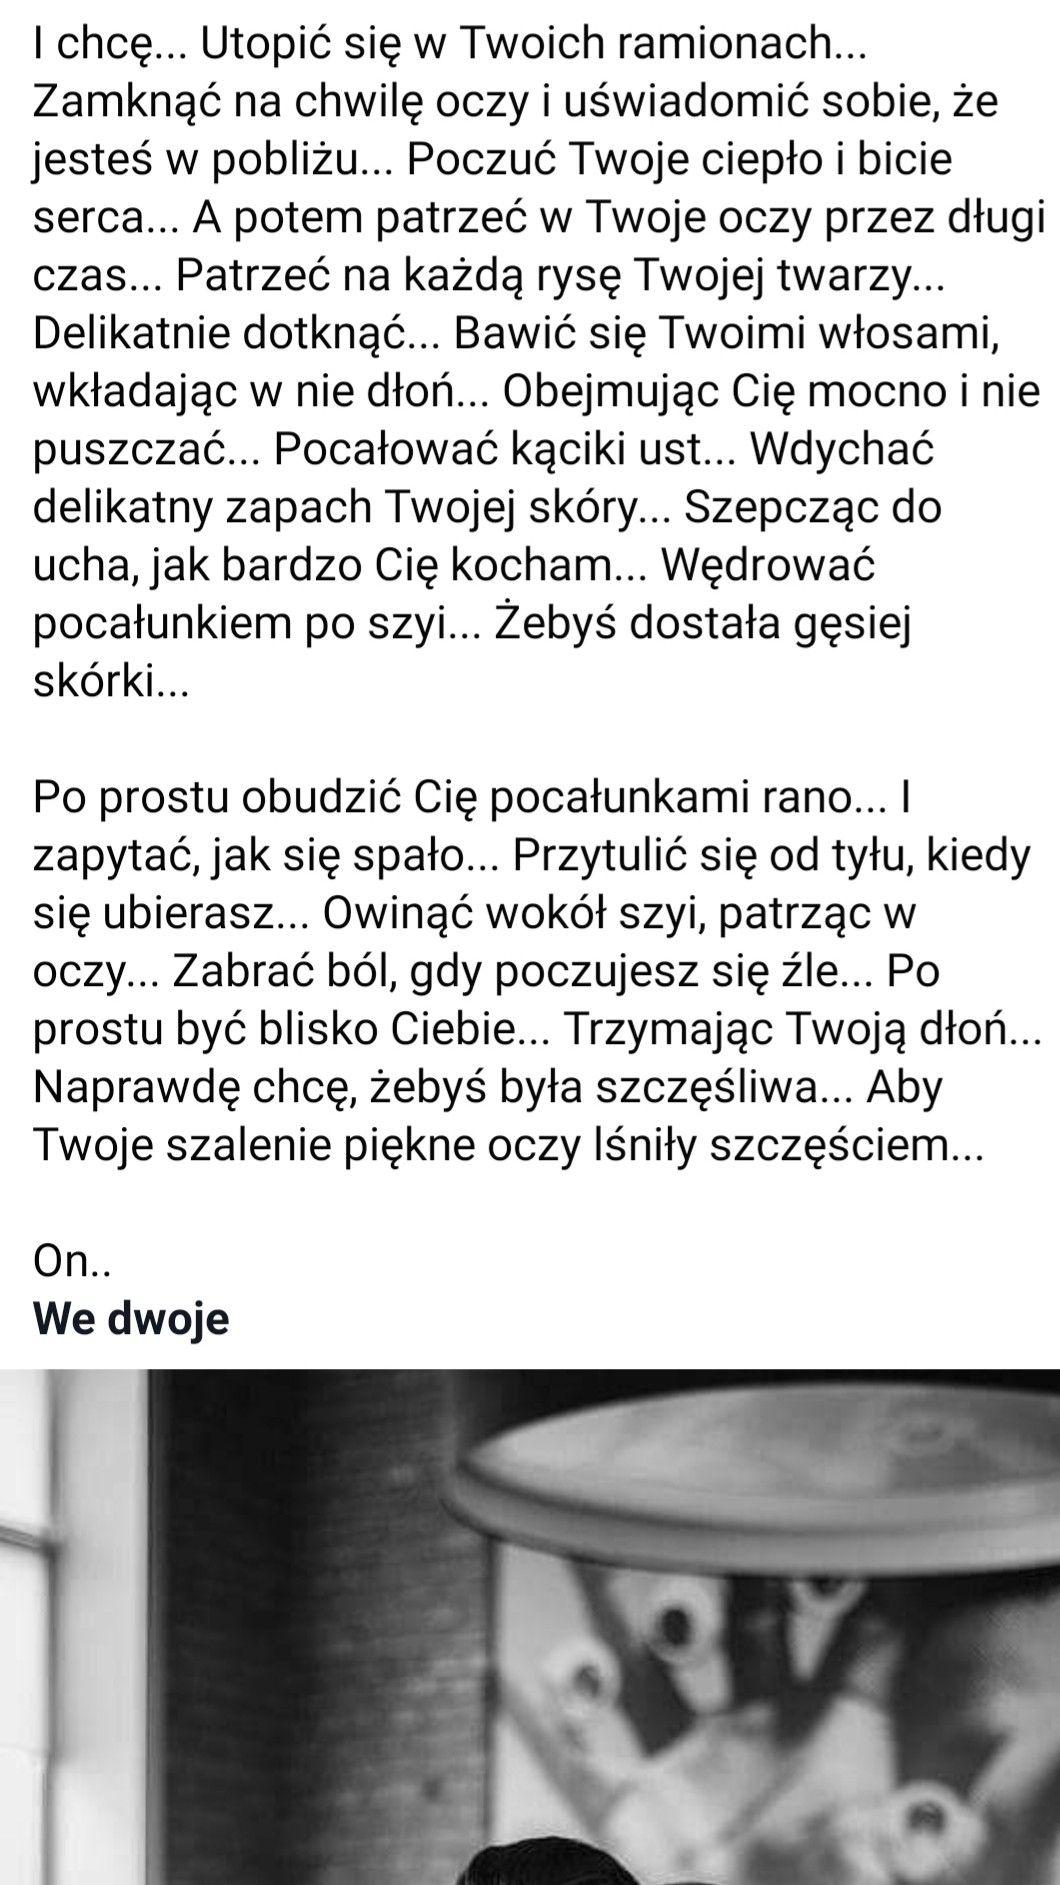 Pin By Honorata Redzisz On Piekne Mysli I Slowa In 2020 Interpersonal Relations Quotes Relatable